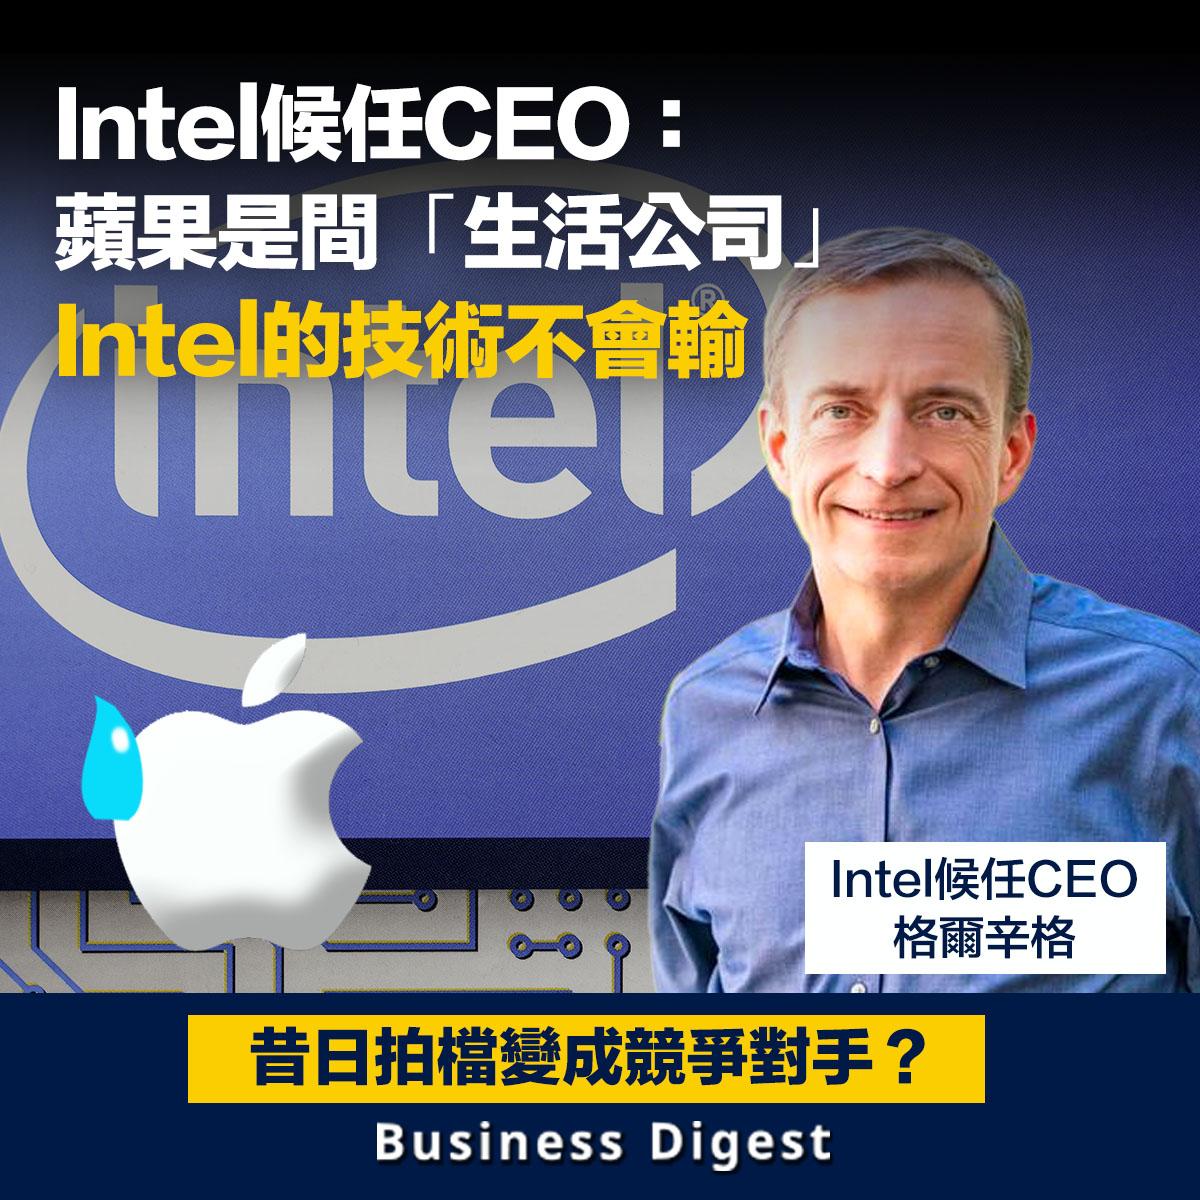 Intel候任CEO:蘋果是間「生活公司」,Intel的技術不會輸